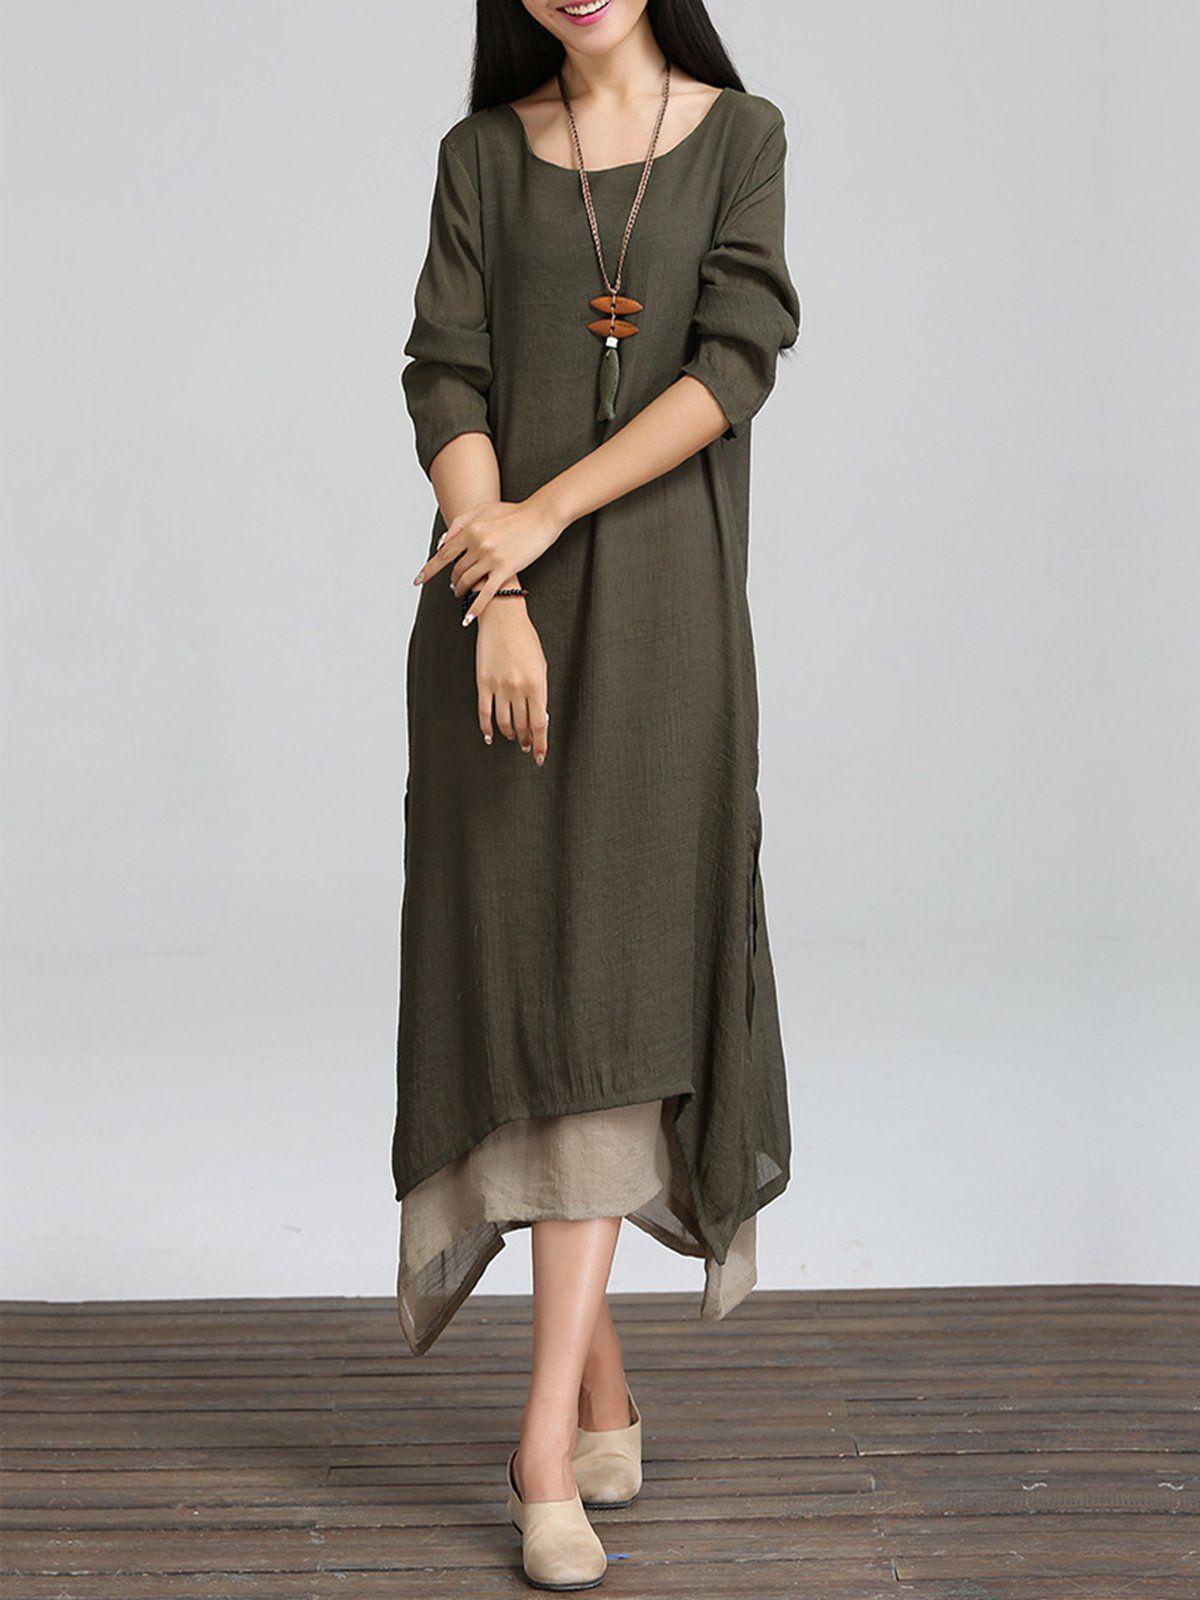 08ae0824f9 Long Sleeve Linen Cotton Crew Neck Casual Plus Size Dress